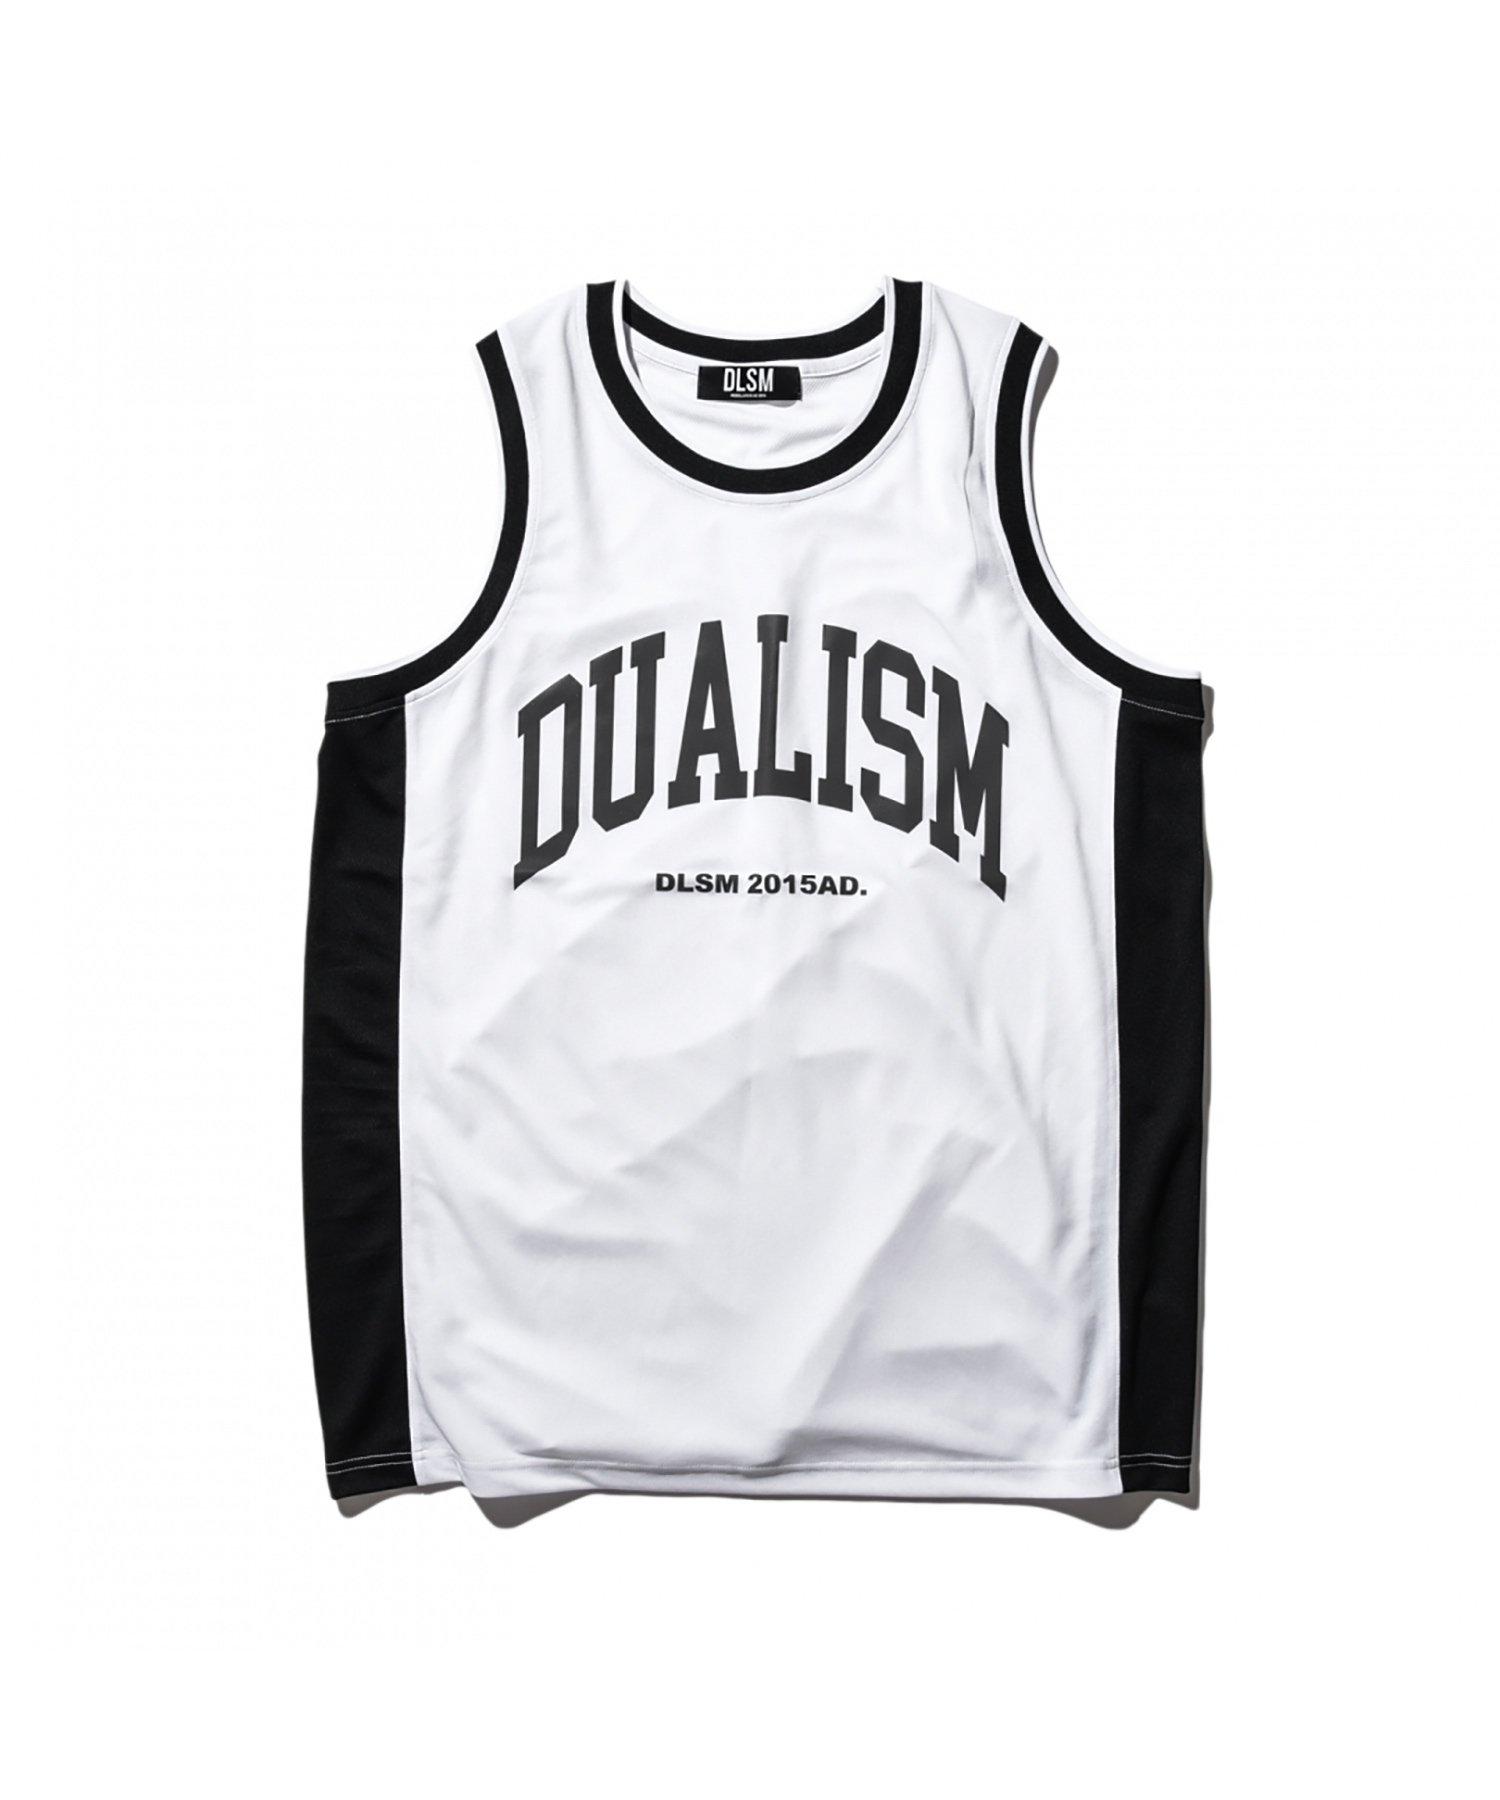 TEAM DUALISM REFLECT ARCH LOGO BASKETBALL TANK